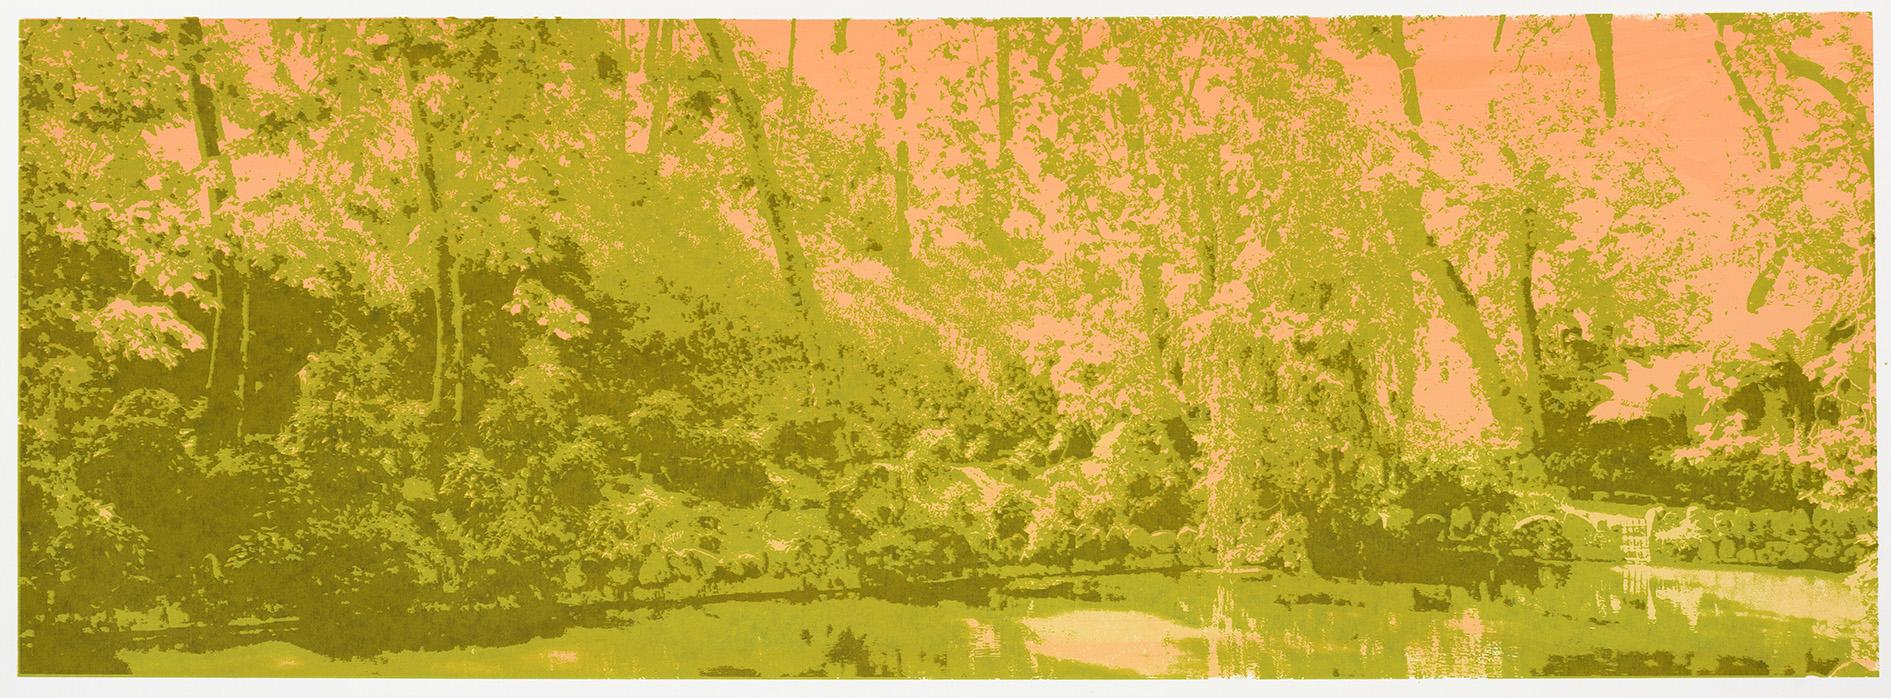 """Change of Seasons II (spring)"", 35 x 100 cm. silkscreenprint (2015)"